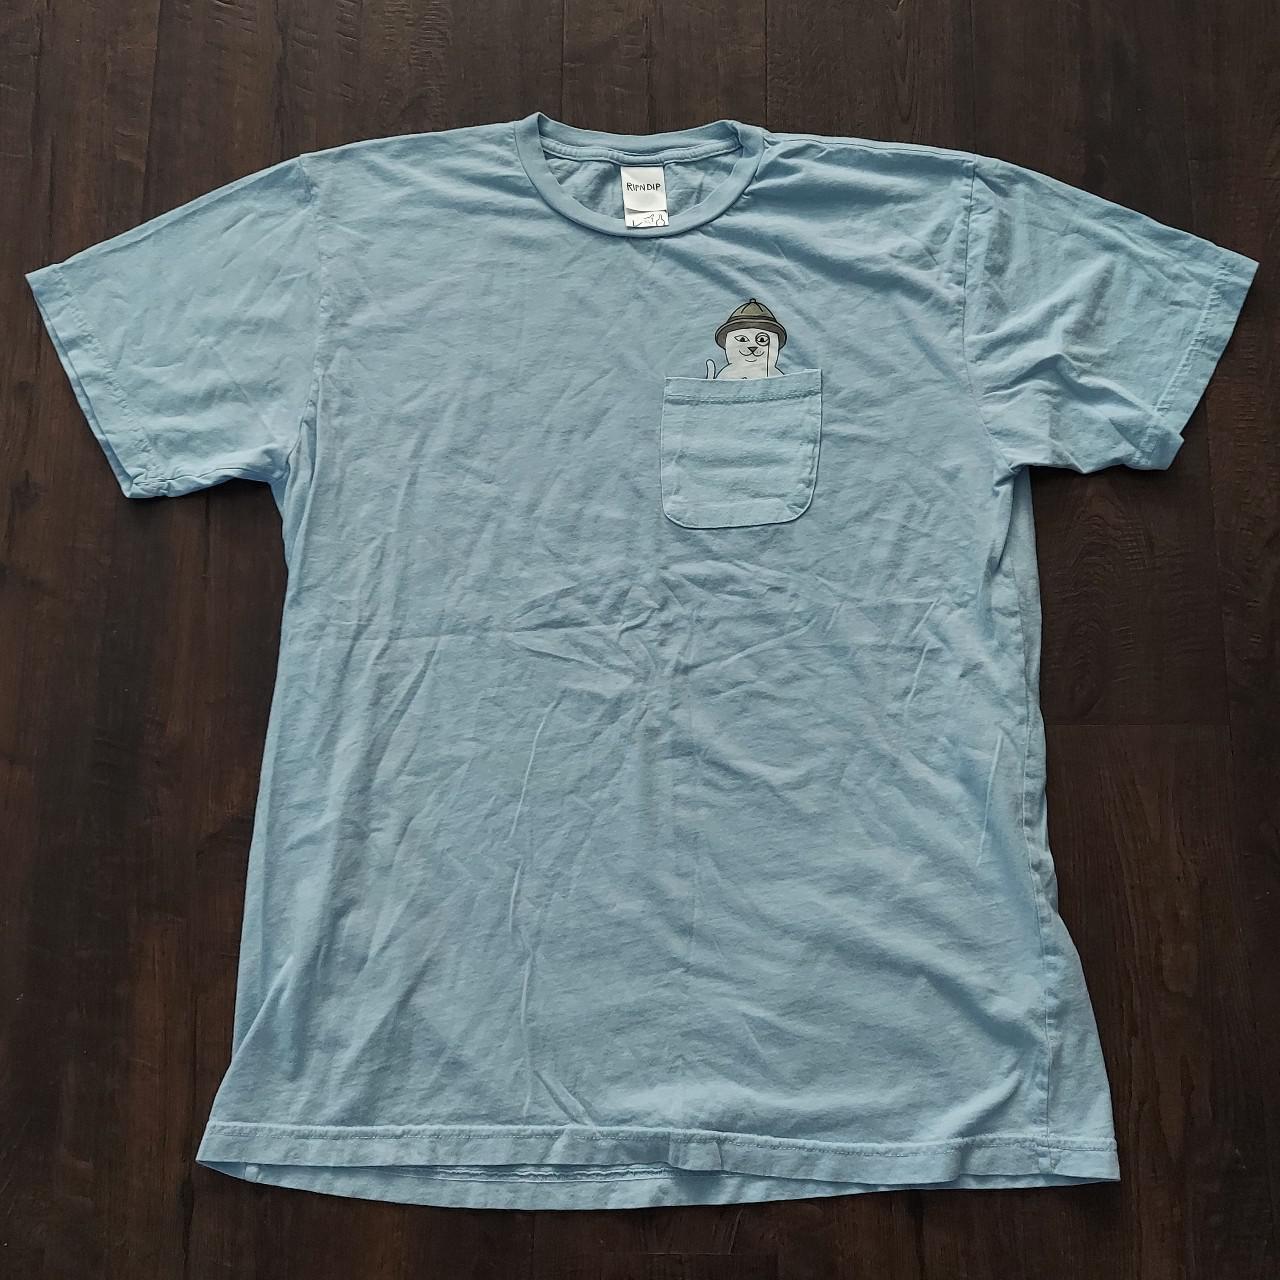 Product Image 1 - Ripdnip t shirt  Nermal explorer